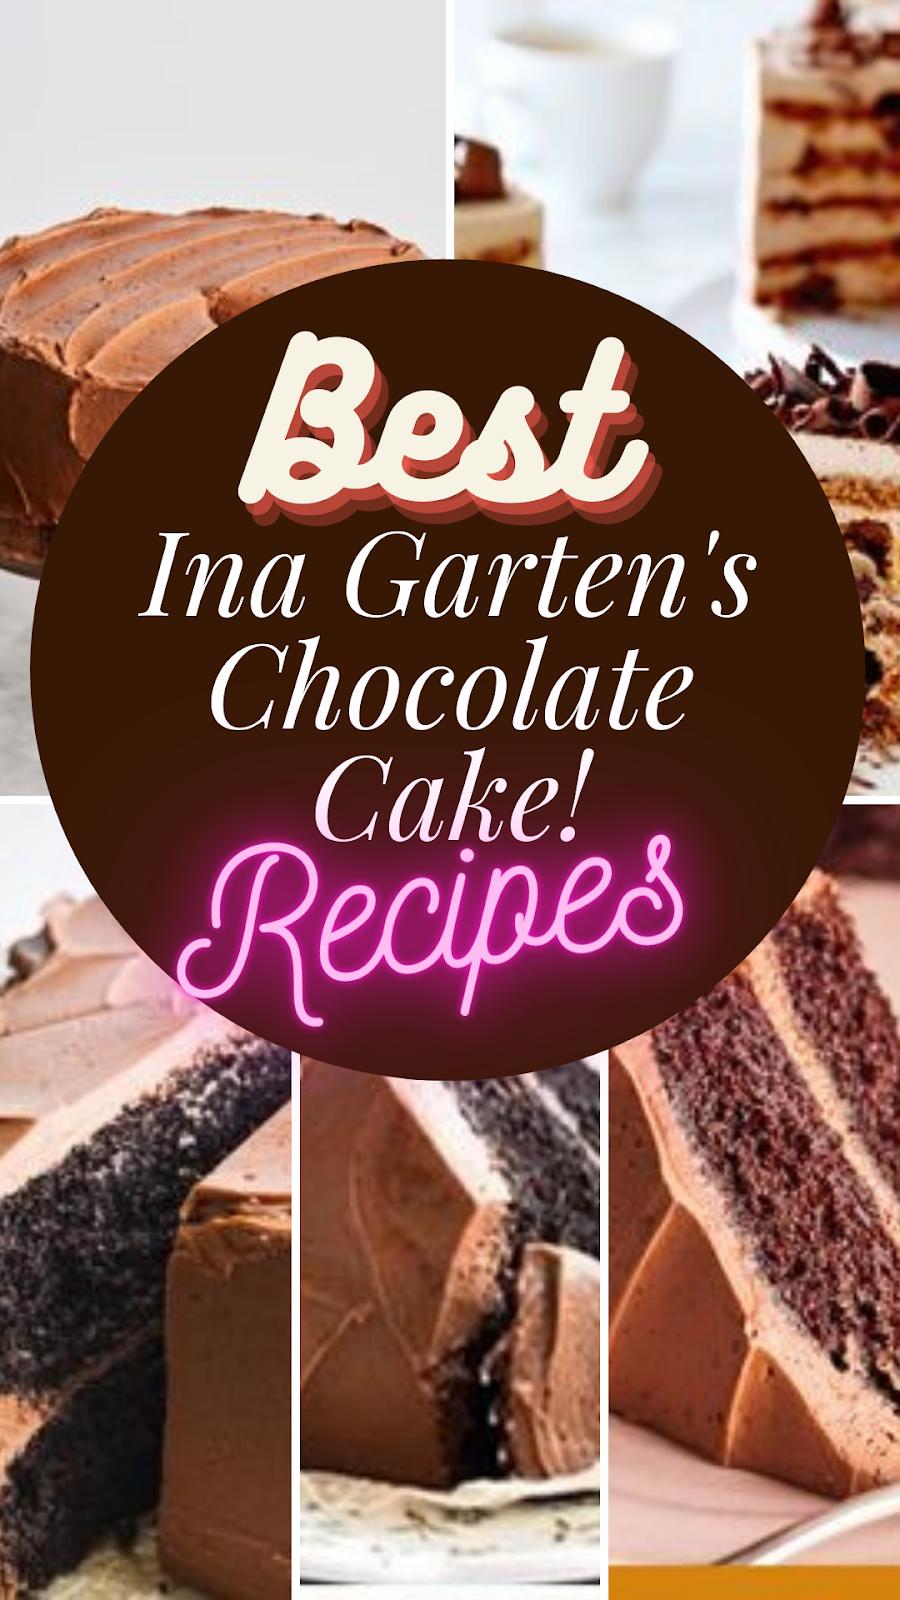 best Ina Garten's Chocolate Cake recipes